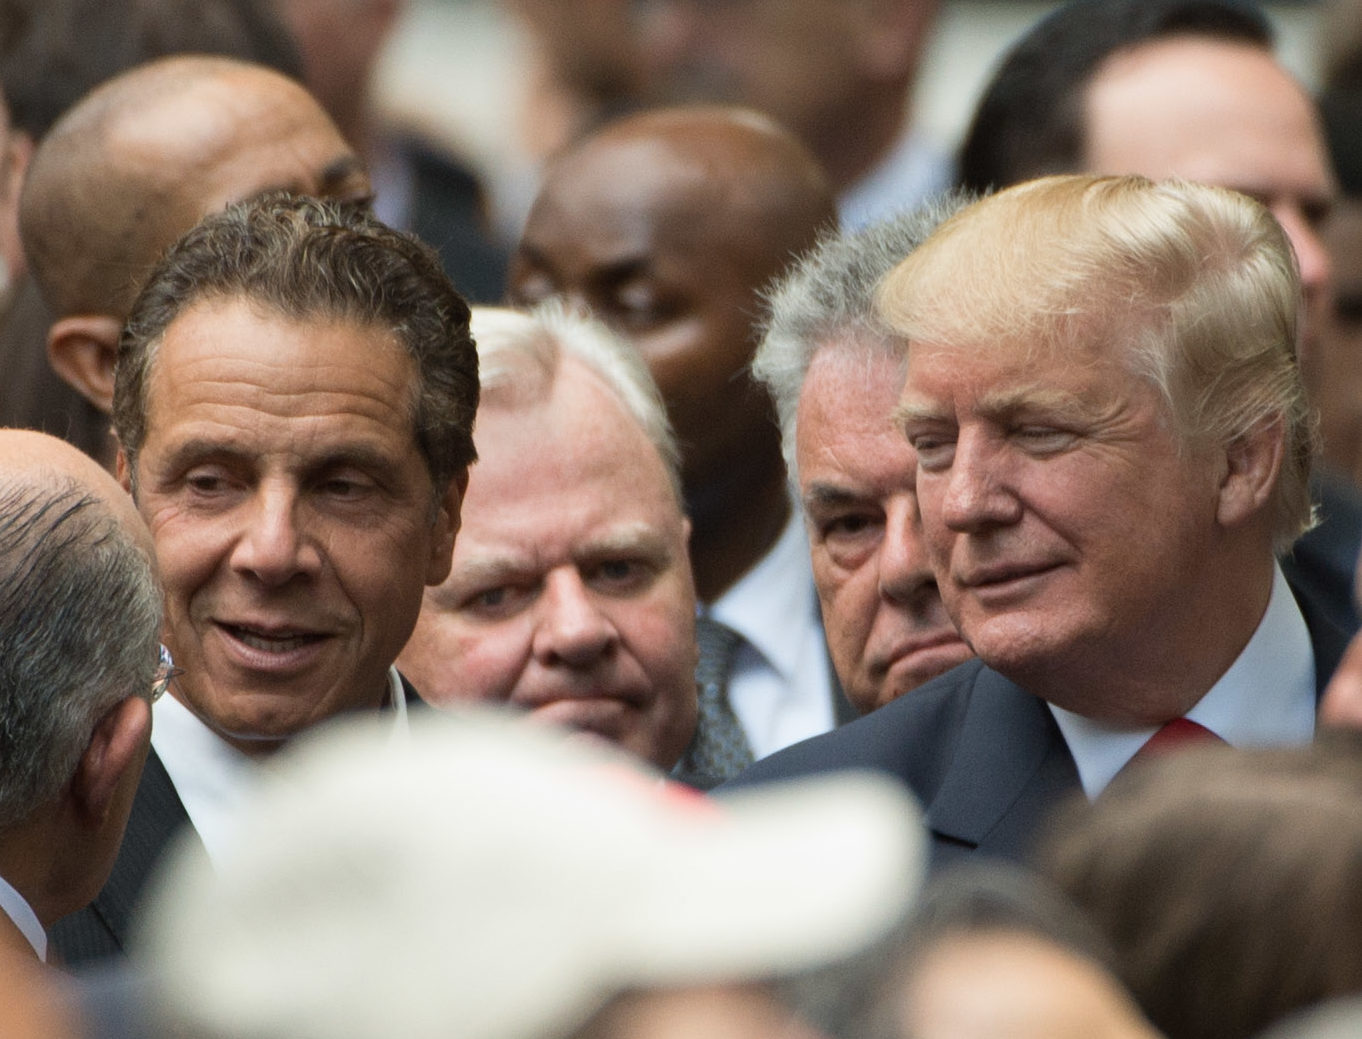 Cuomo Closes New York Schools Until At Least April